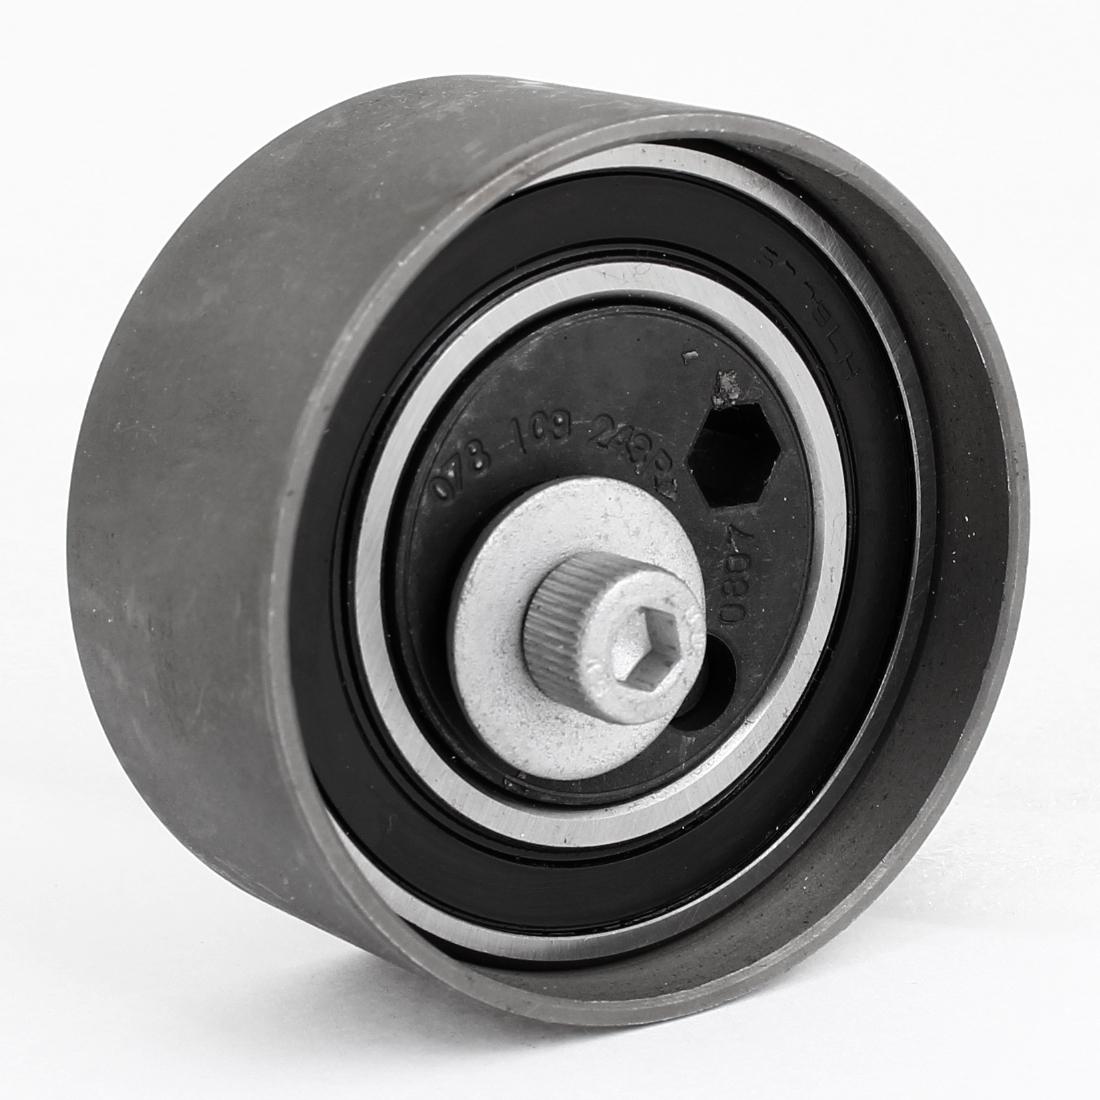 078109243R Vehicle Car 8mm Bore Dia Engine Timing Belt Tensioner Roller